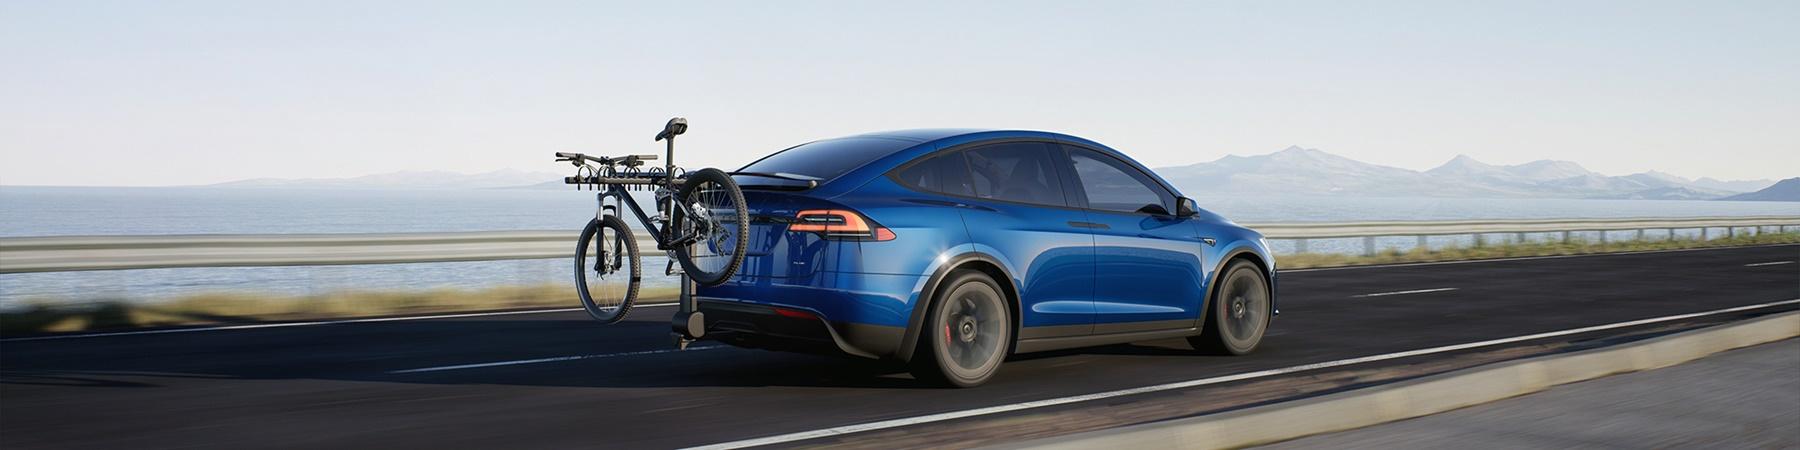 Tesla Model X 90kWh 493 km actieradius